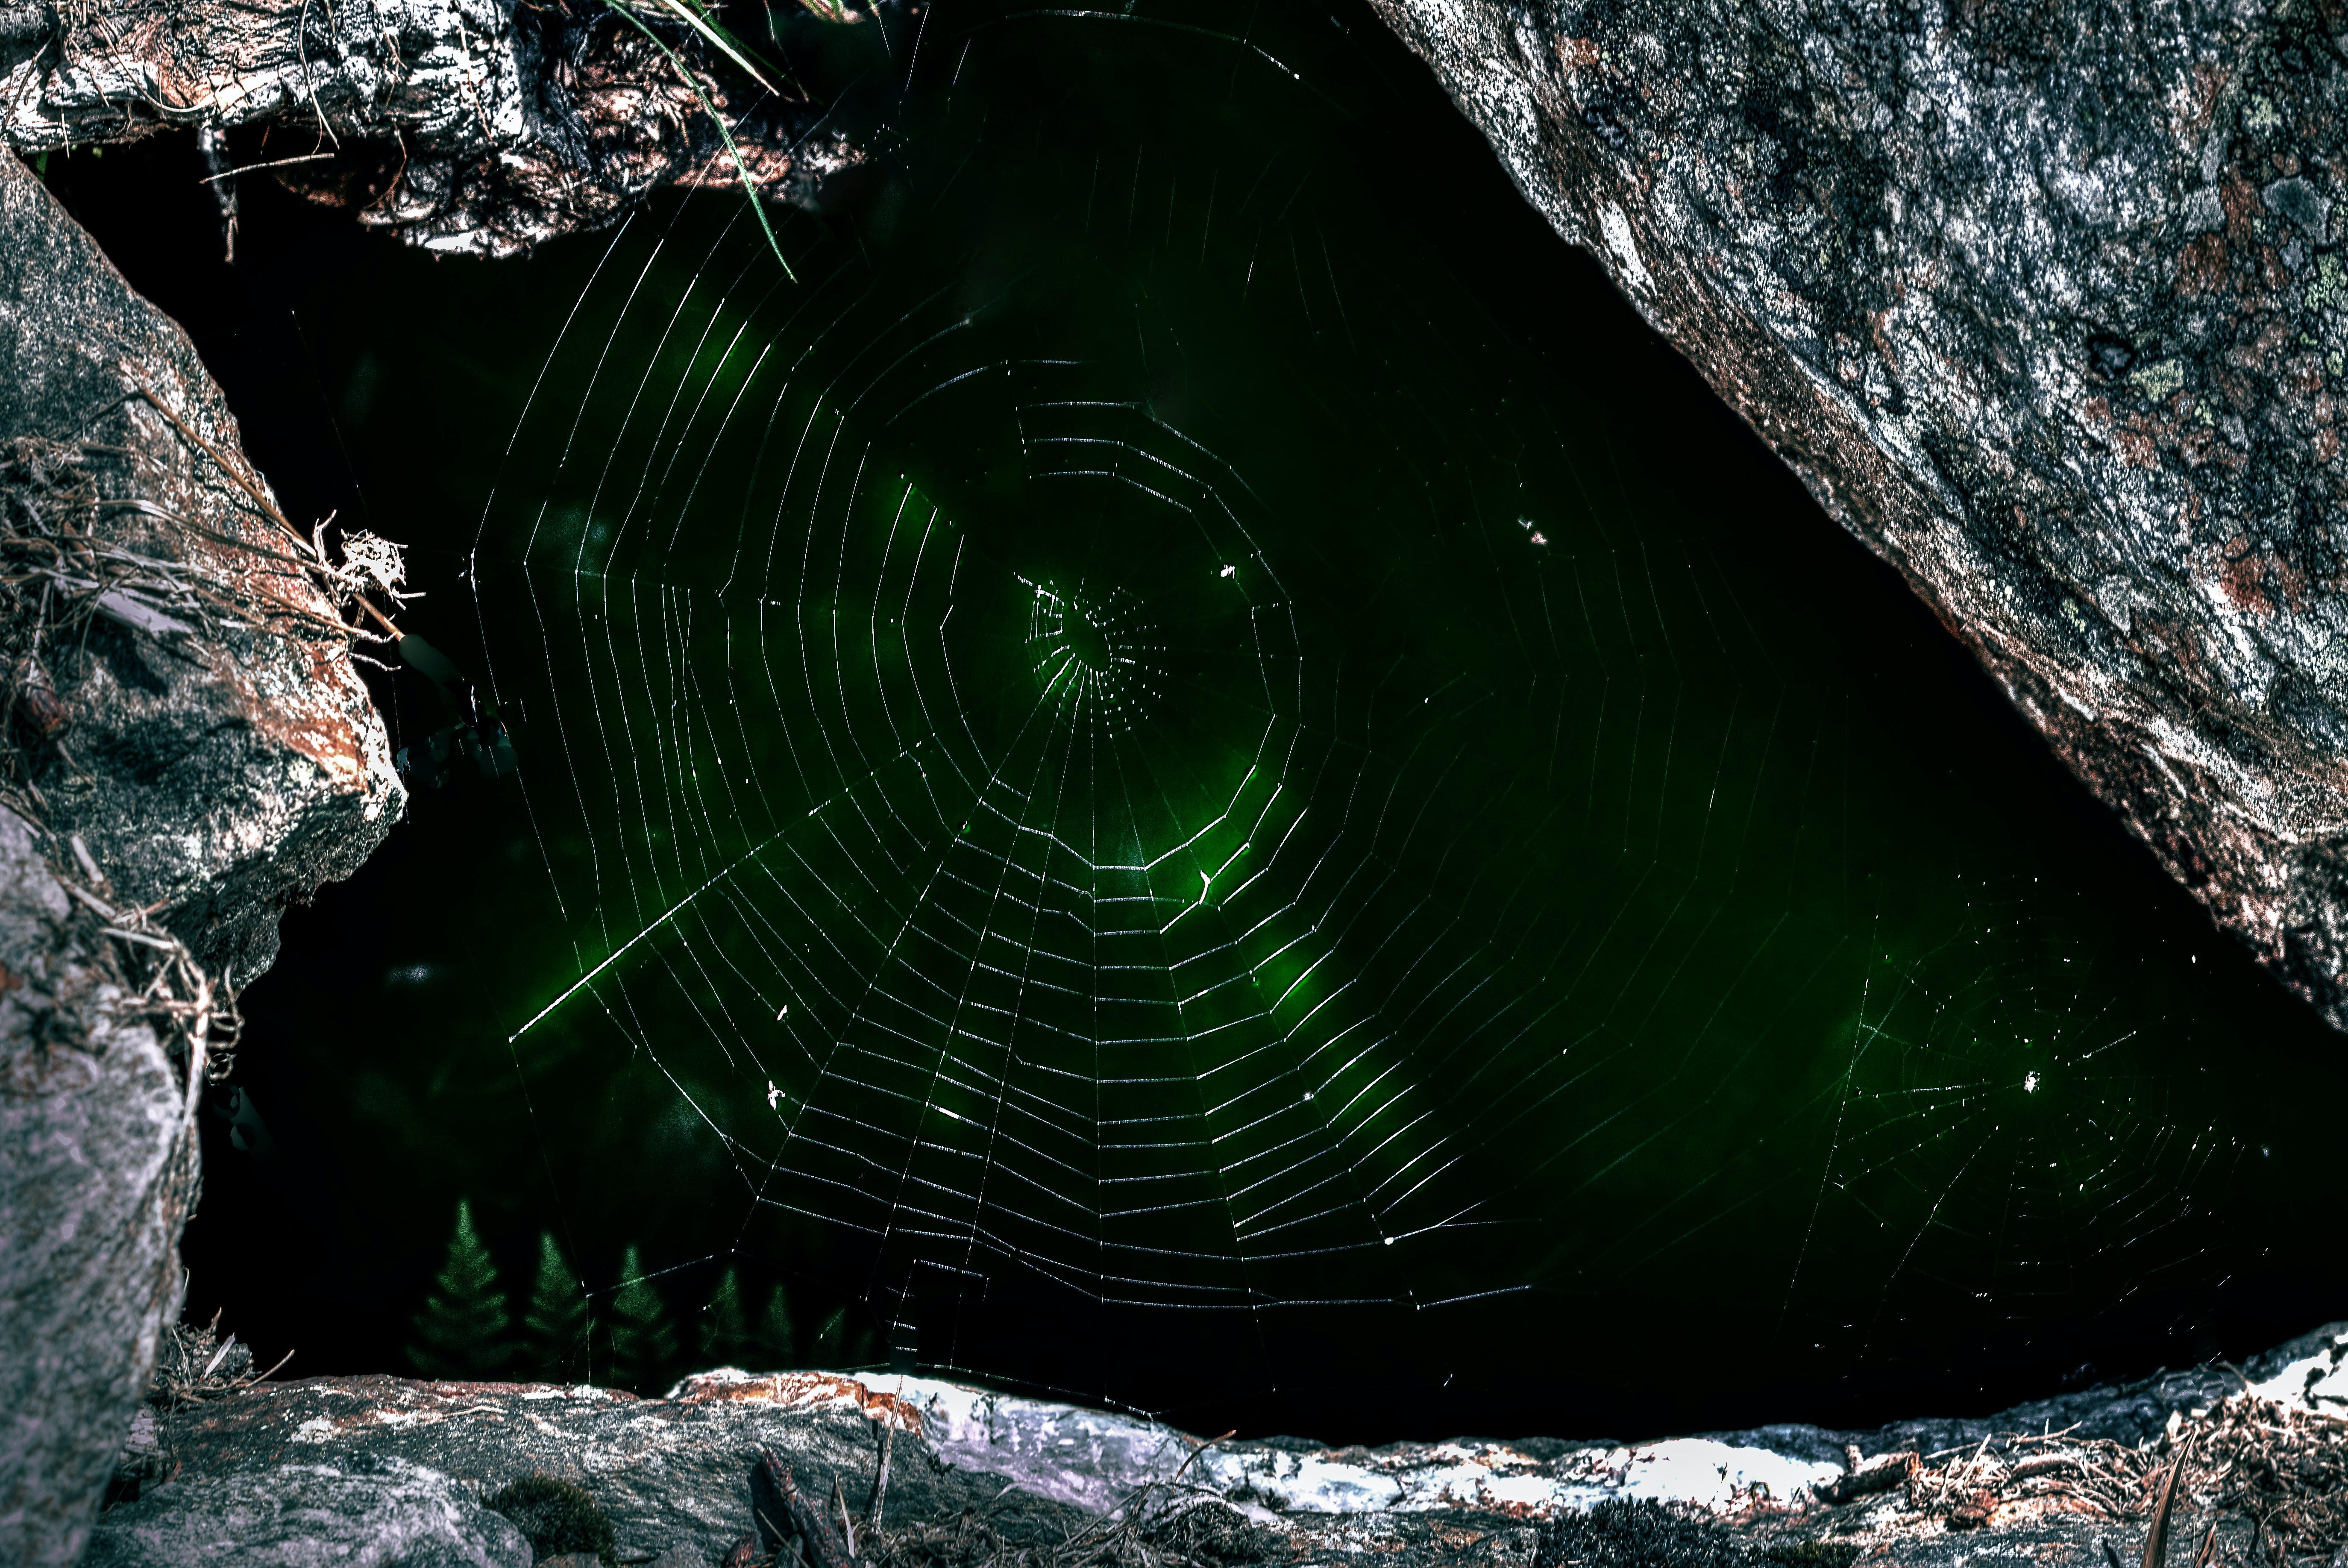 Macro Photograph of Spider's Web